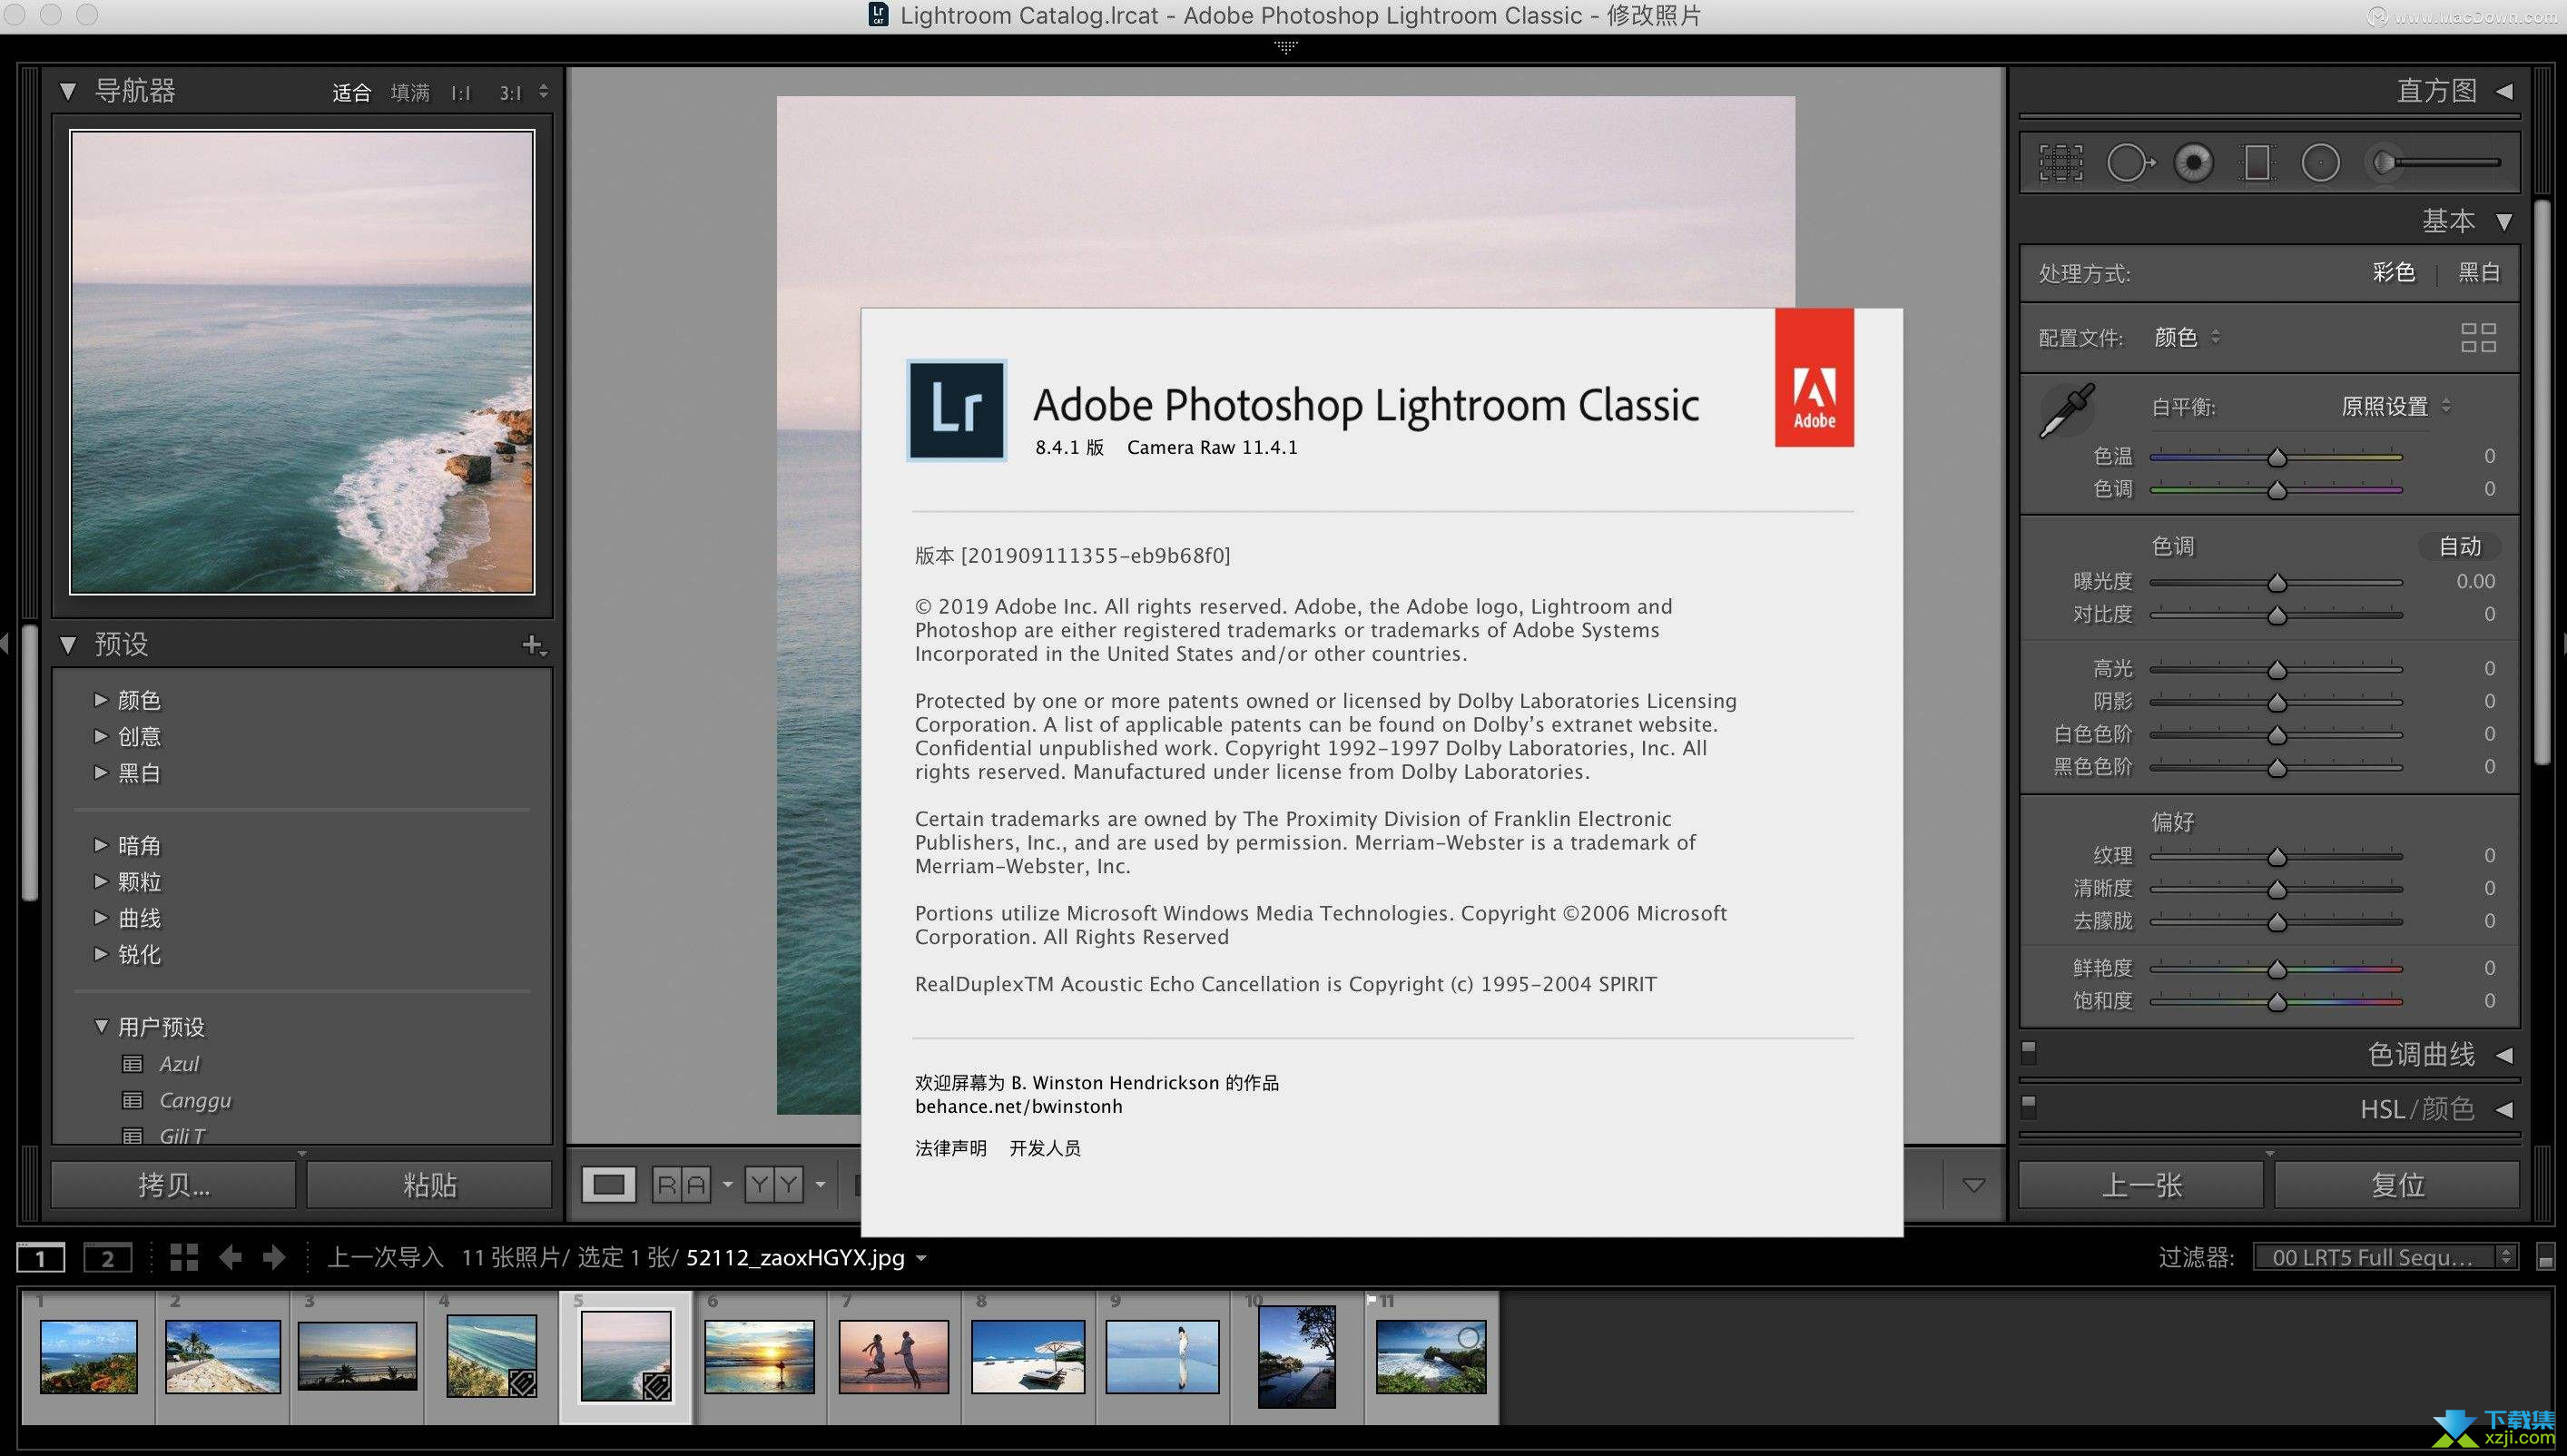 Adobe Photoshop Lightroom Classic界面1